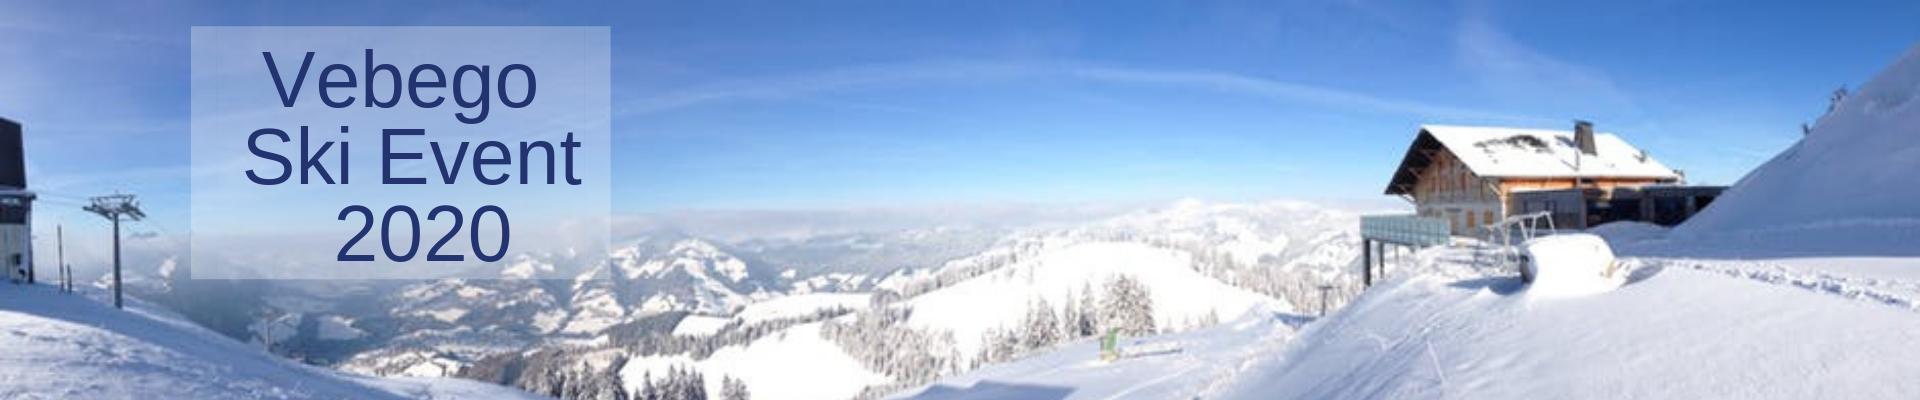 Vebego Ski Event 2020